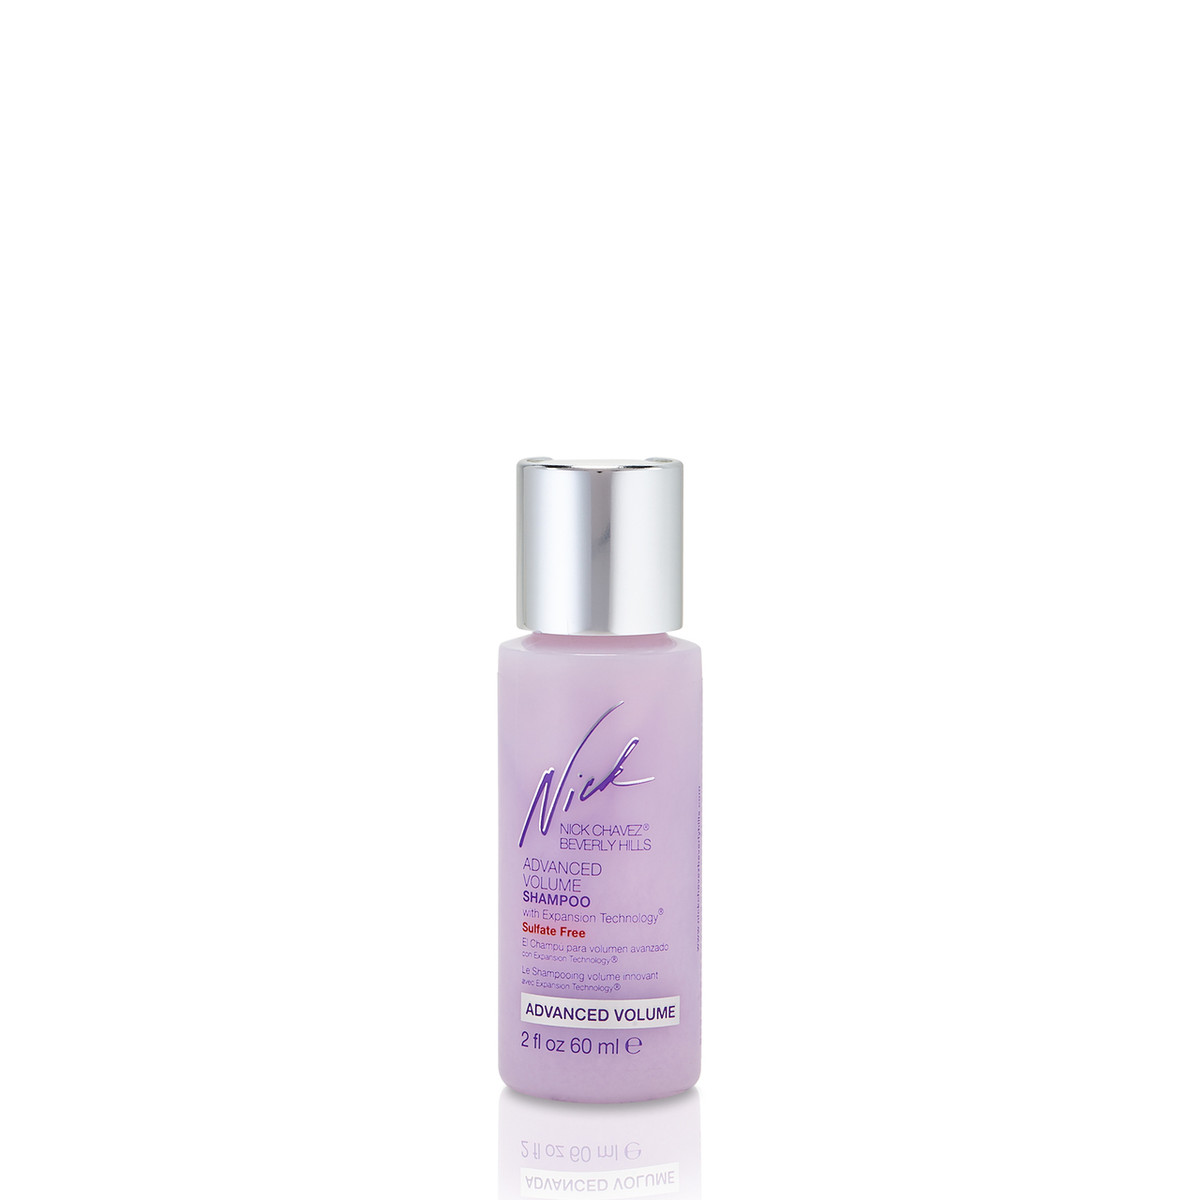 2oz Advanced Volume Sulfate Free Shampoo